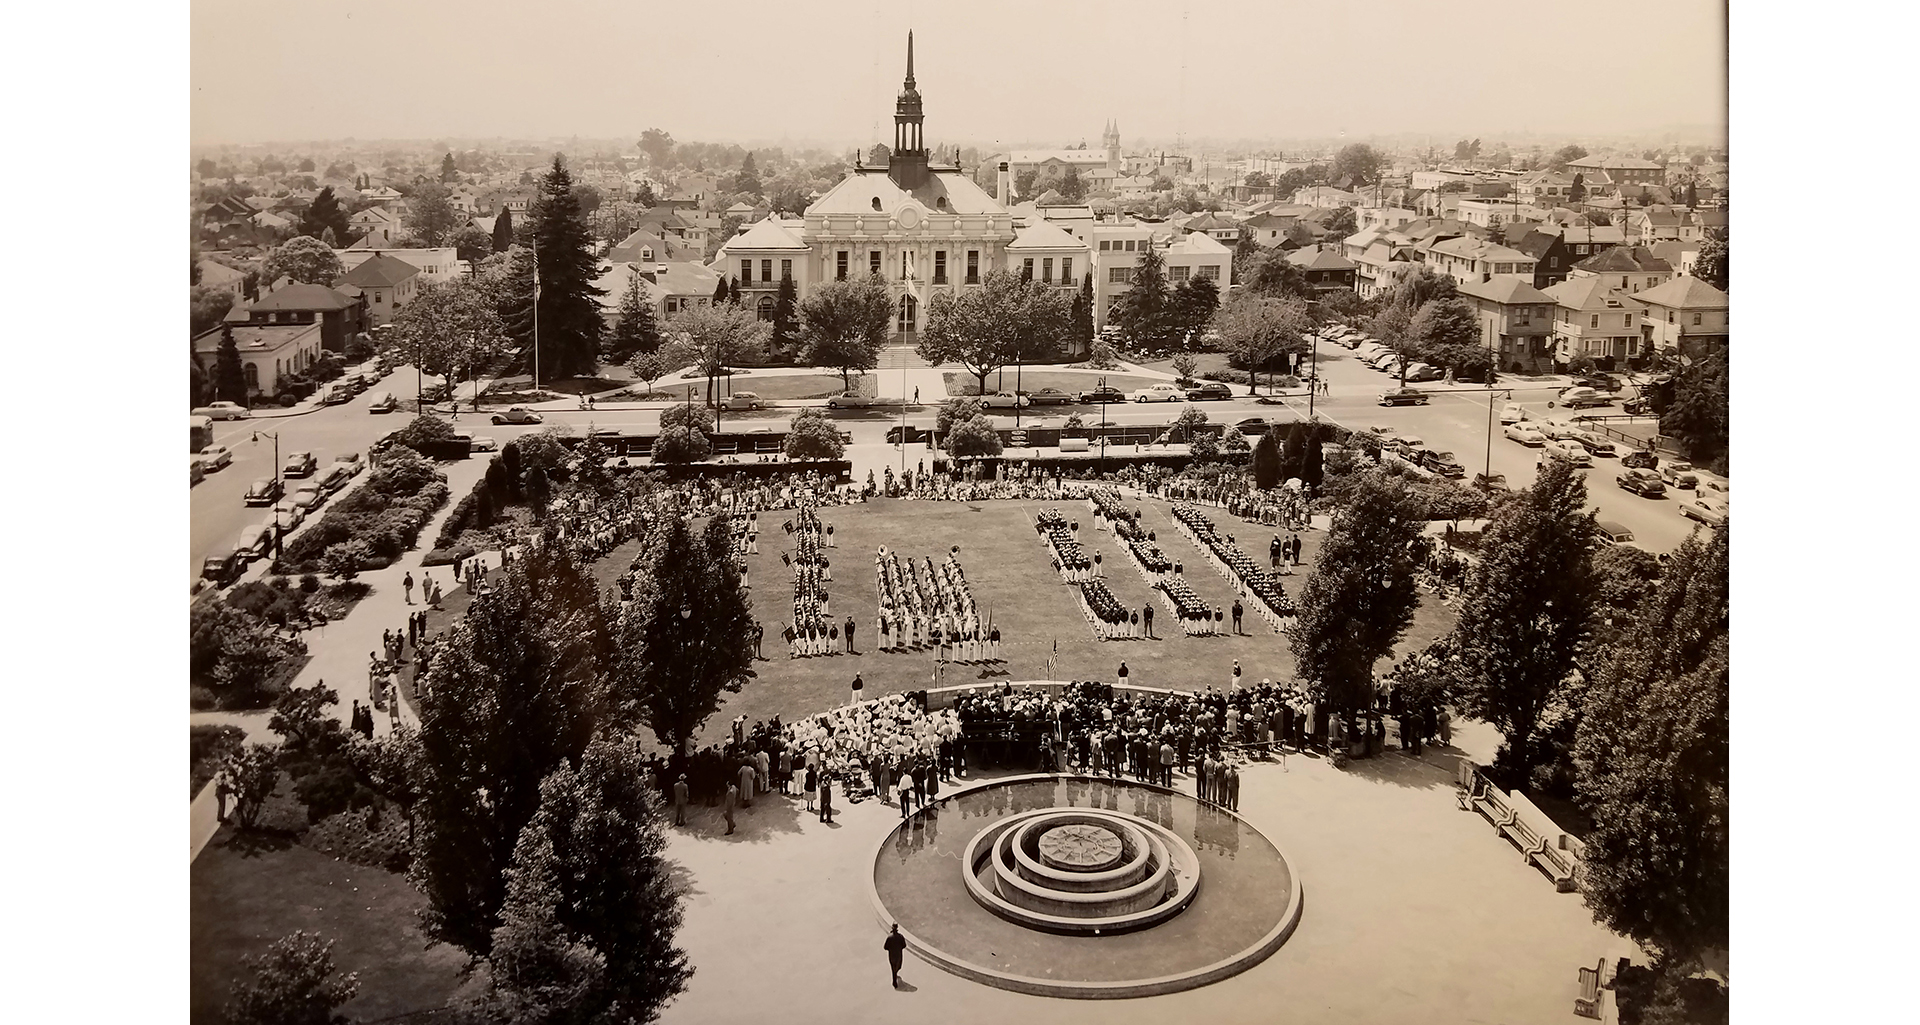 Berkeley Civic Center Park circa 1950 without flagstone